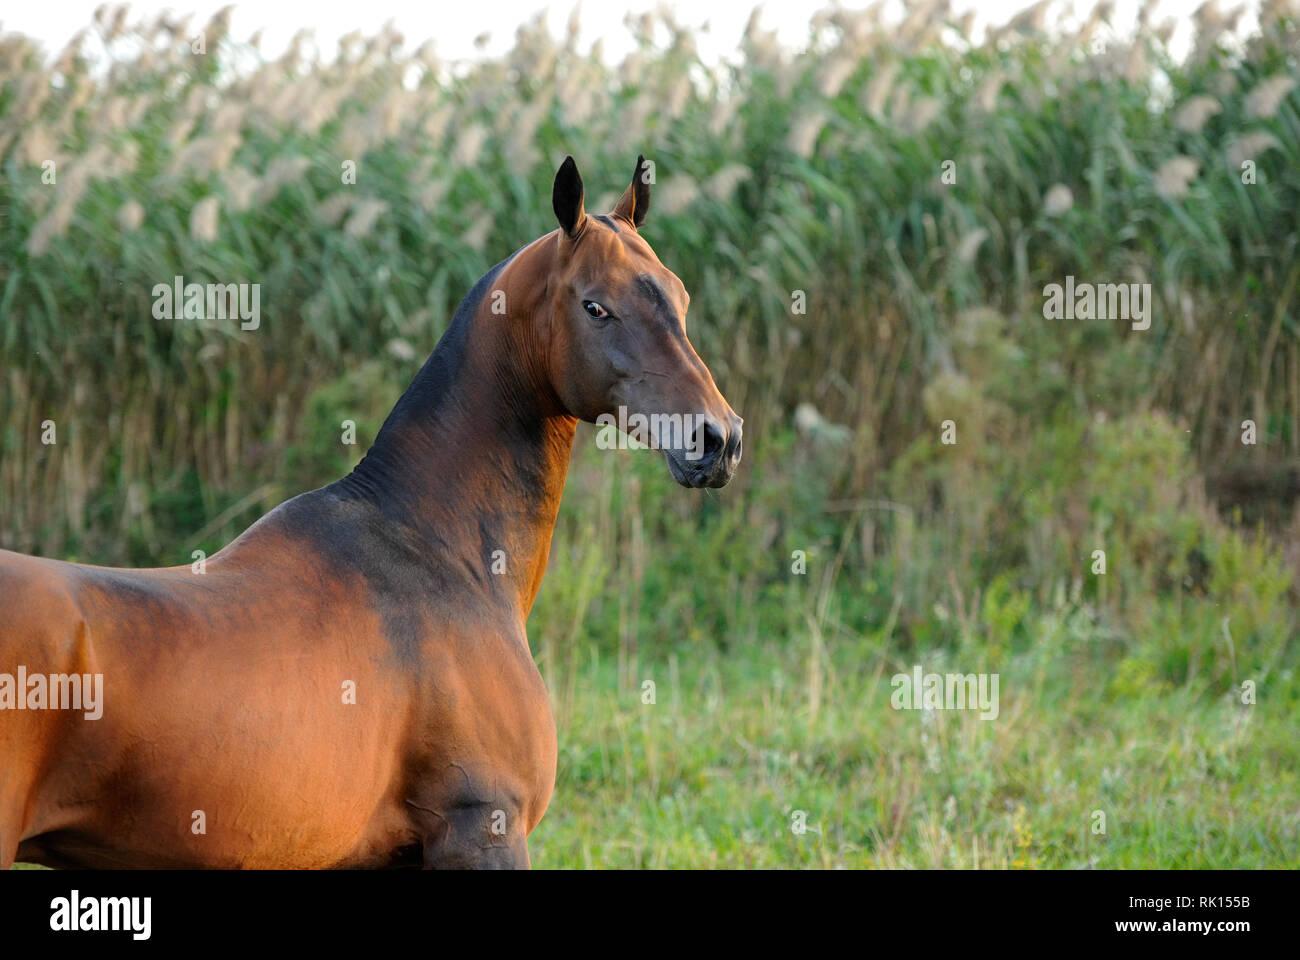 face,akhal teke,animal,background,bay,beautiful,beauty,bony,brown,close up,coat,cute,equestrian,equine,eye,eyes,head,horizontal,horse,intelligent,look - Stock Image